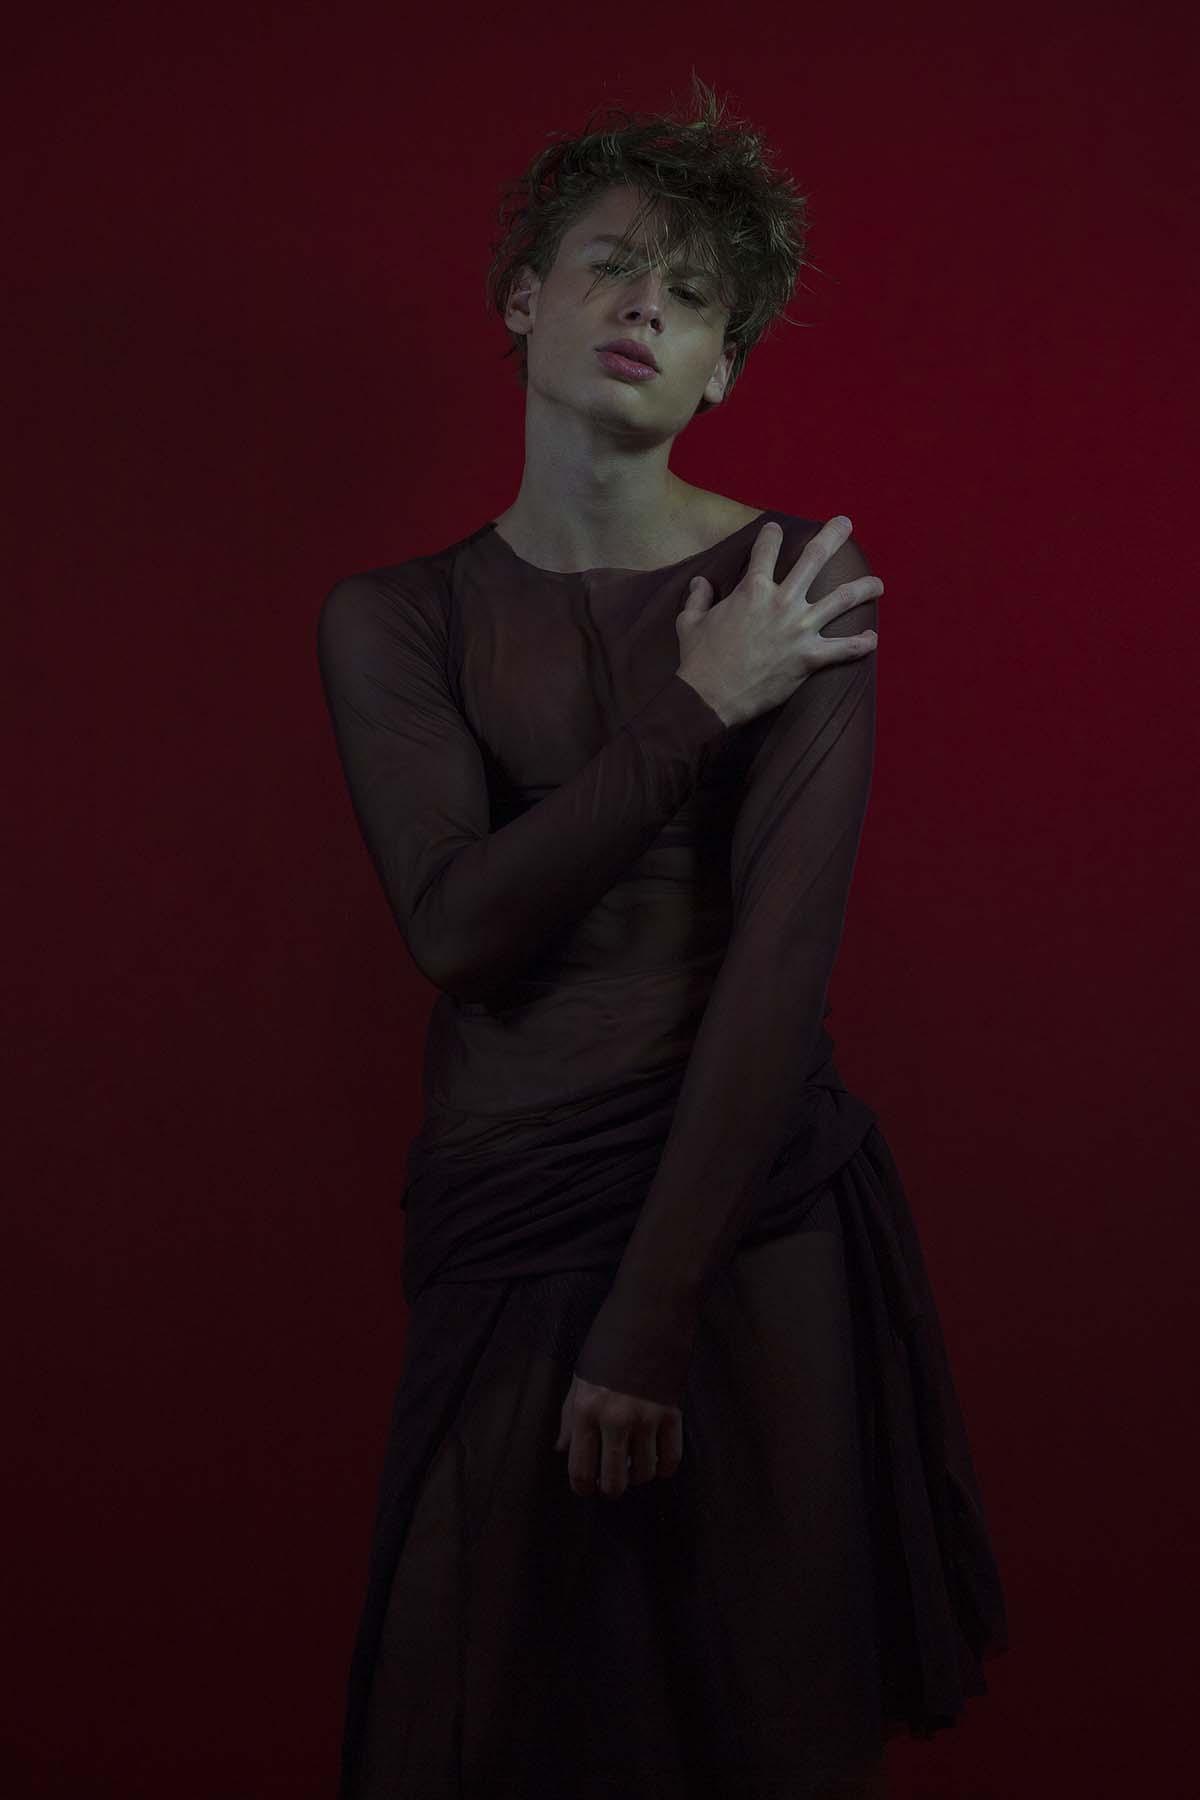 Henrique Drummon by Vinícius Moreira for Brazilian Male Model